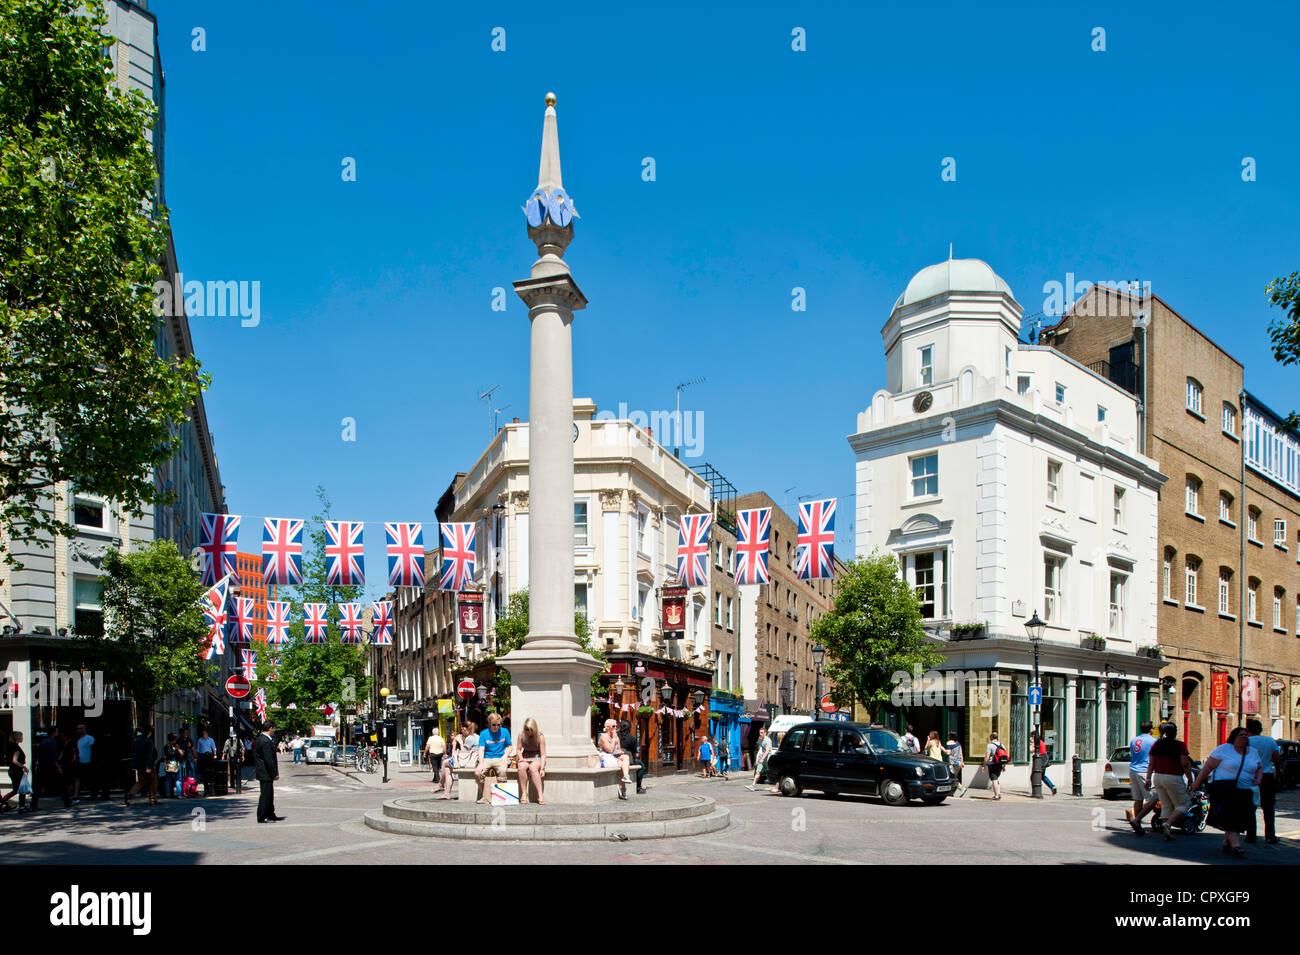 Seven Dials, Covent Garden, London, United Kingdom - Stock Image